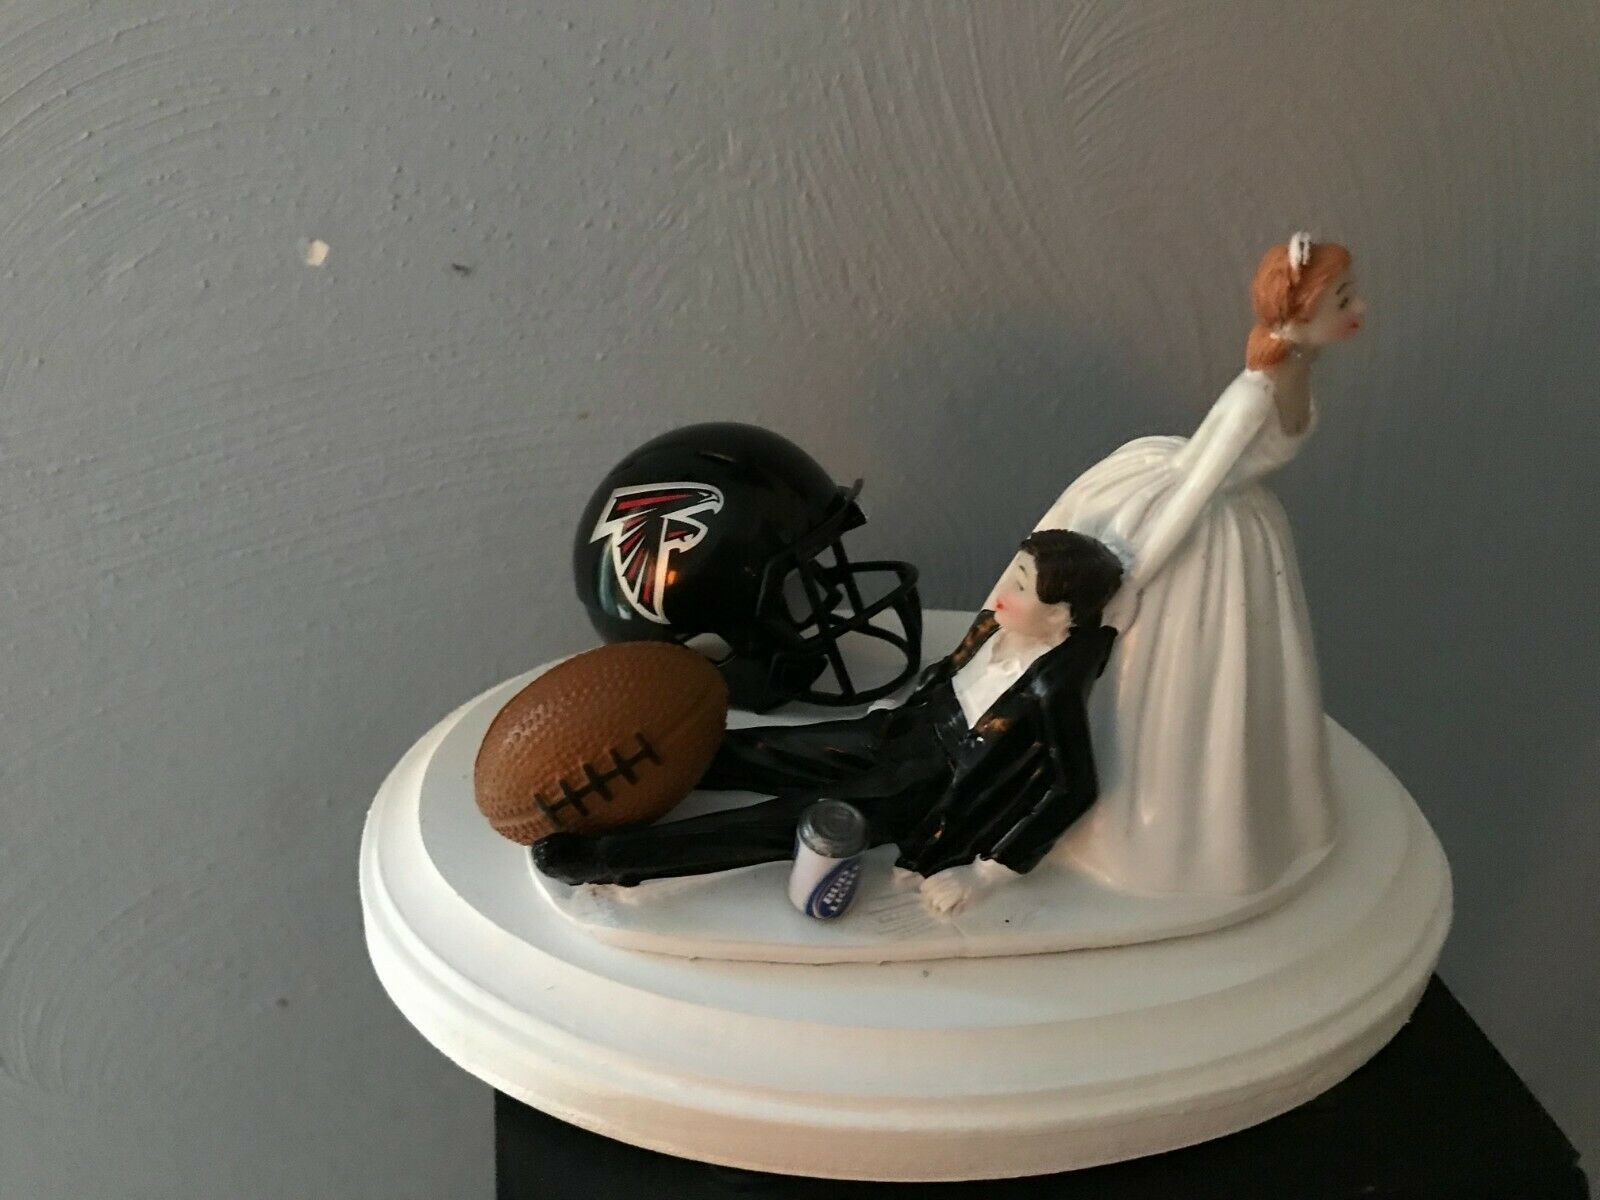 Atlanta Falcons  Cake Topper Bride Groom Wedding day NFL Funny Football Theme